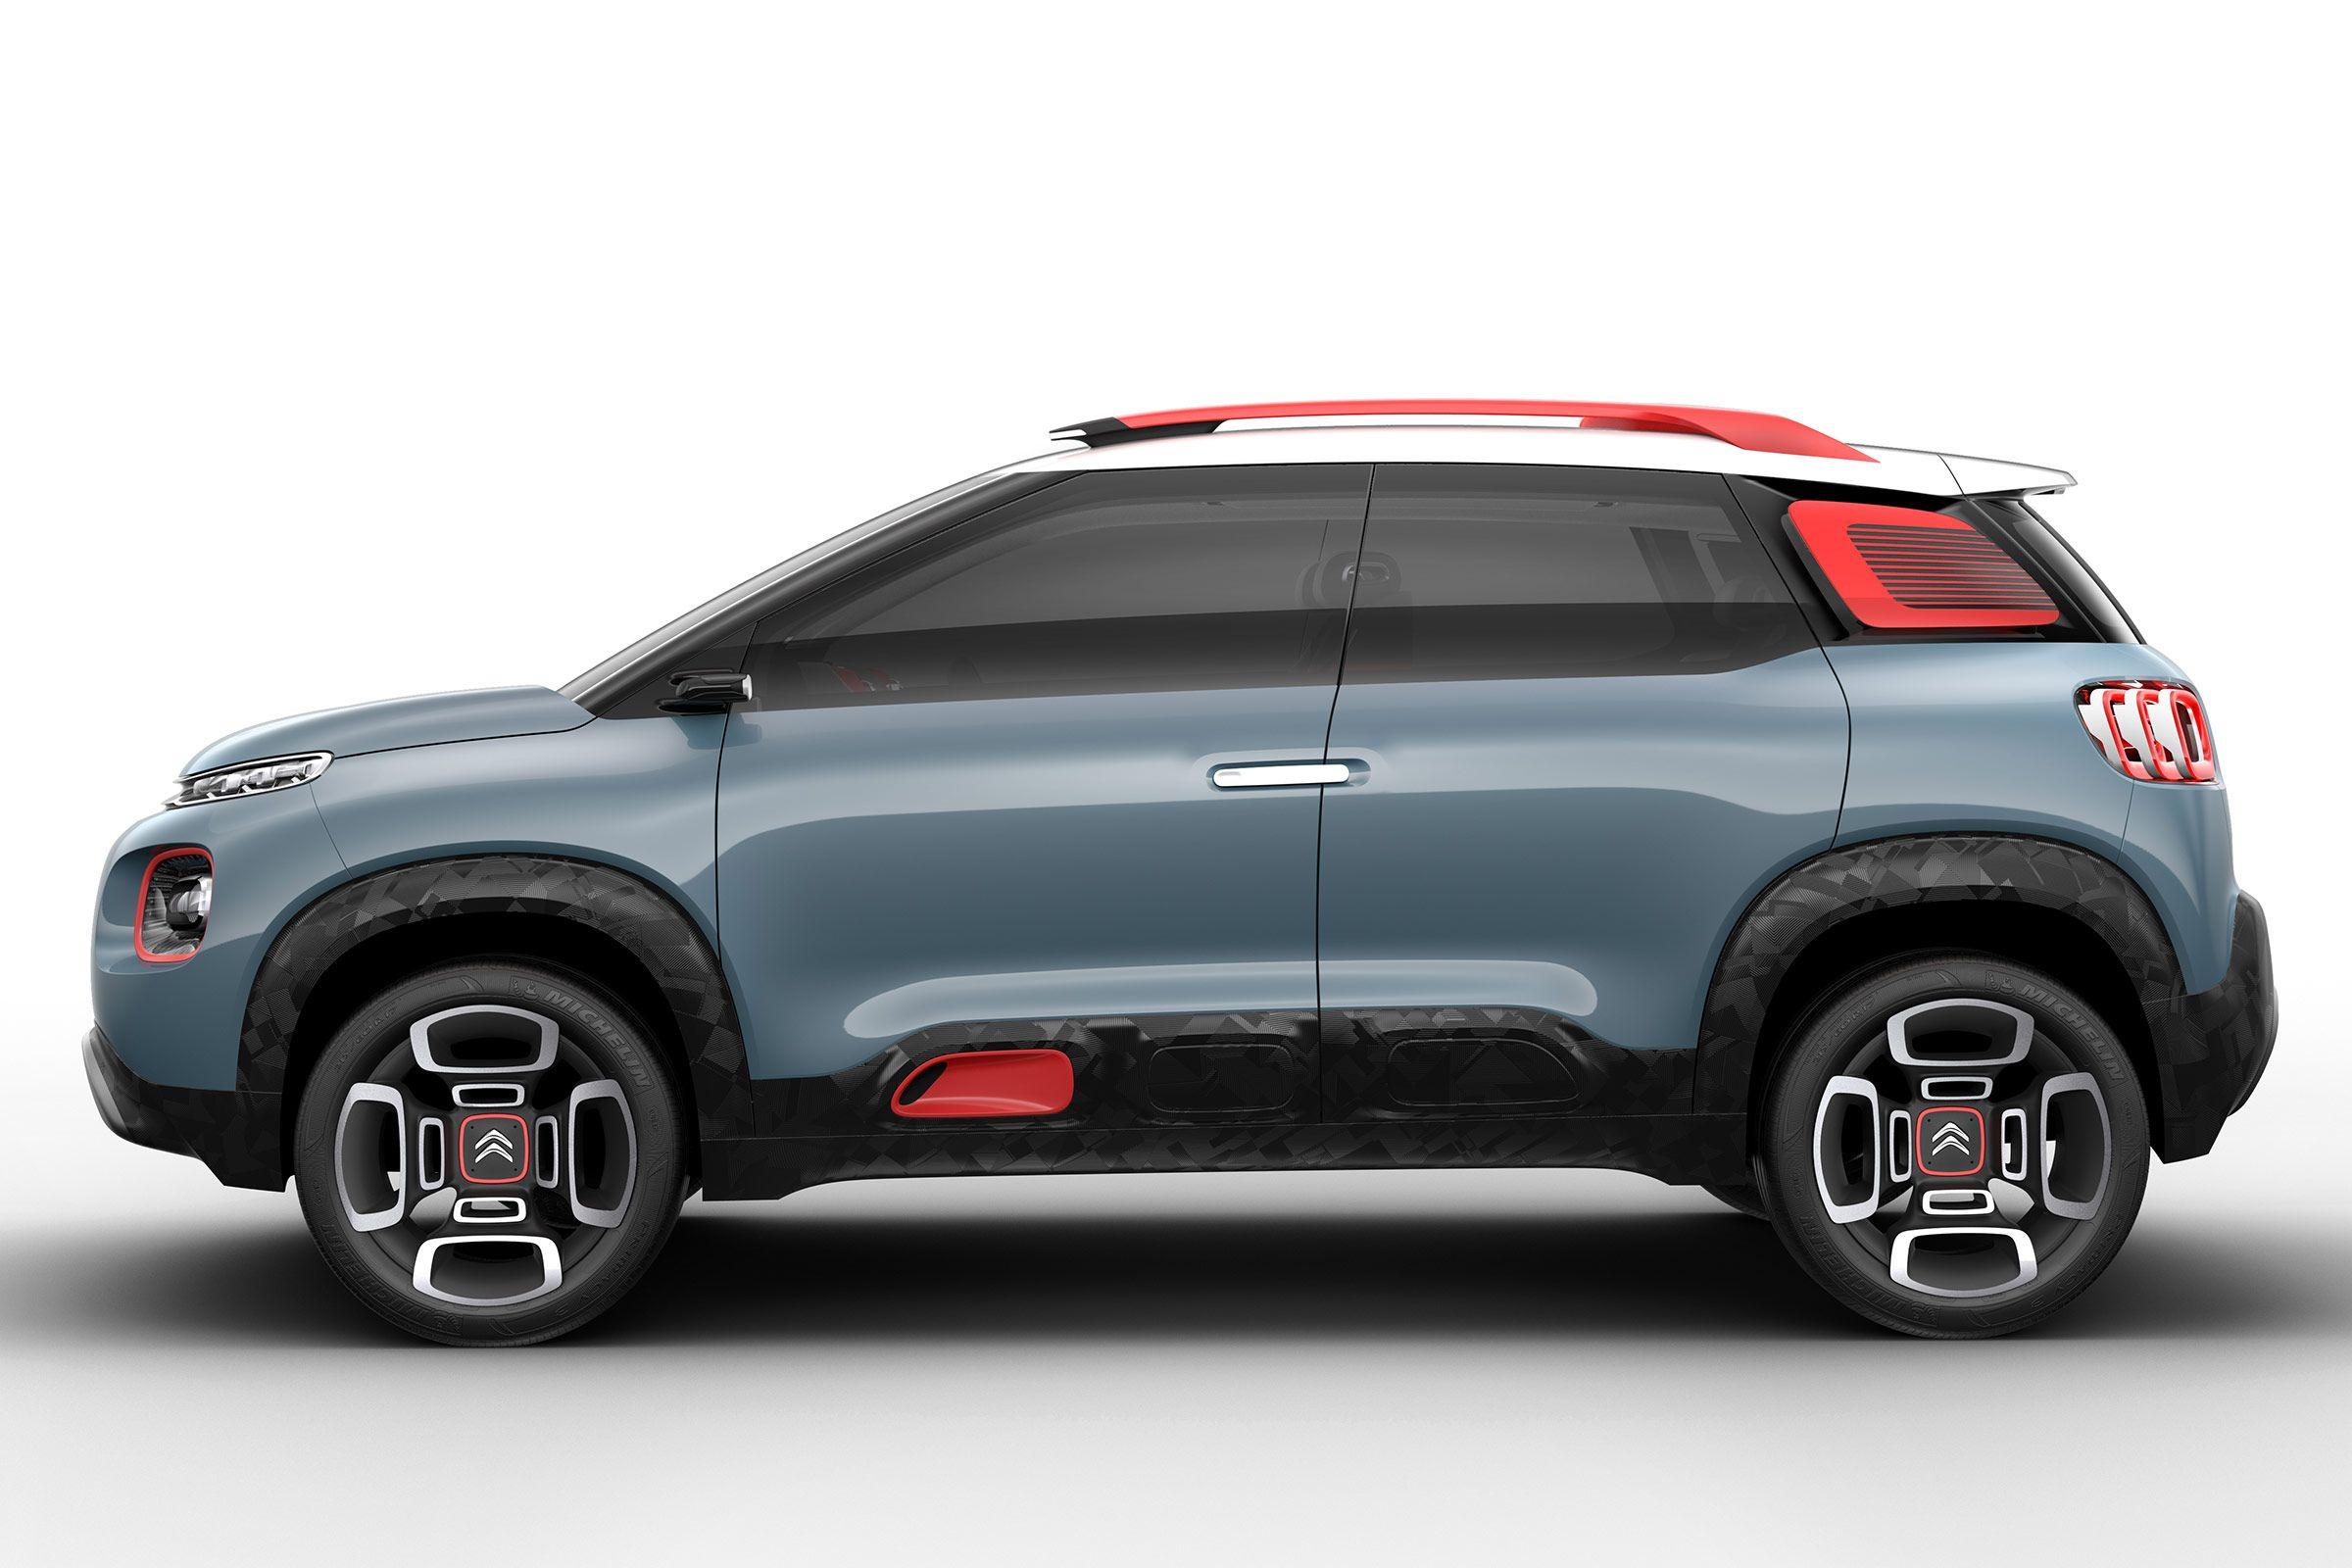 Citroen C-Aircross Concept 2017 - pictures | Citroen C-Aircross Concept 2017 - side | Auto Express